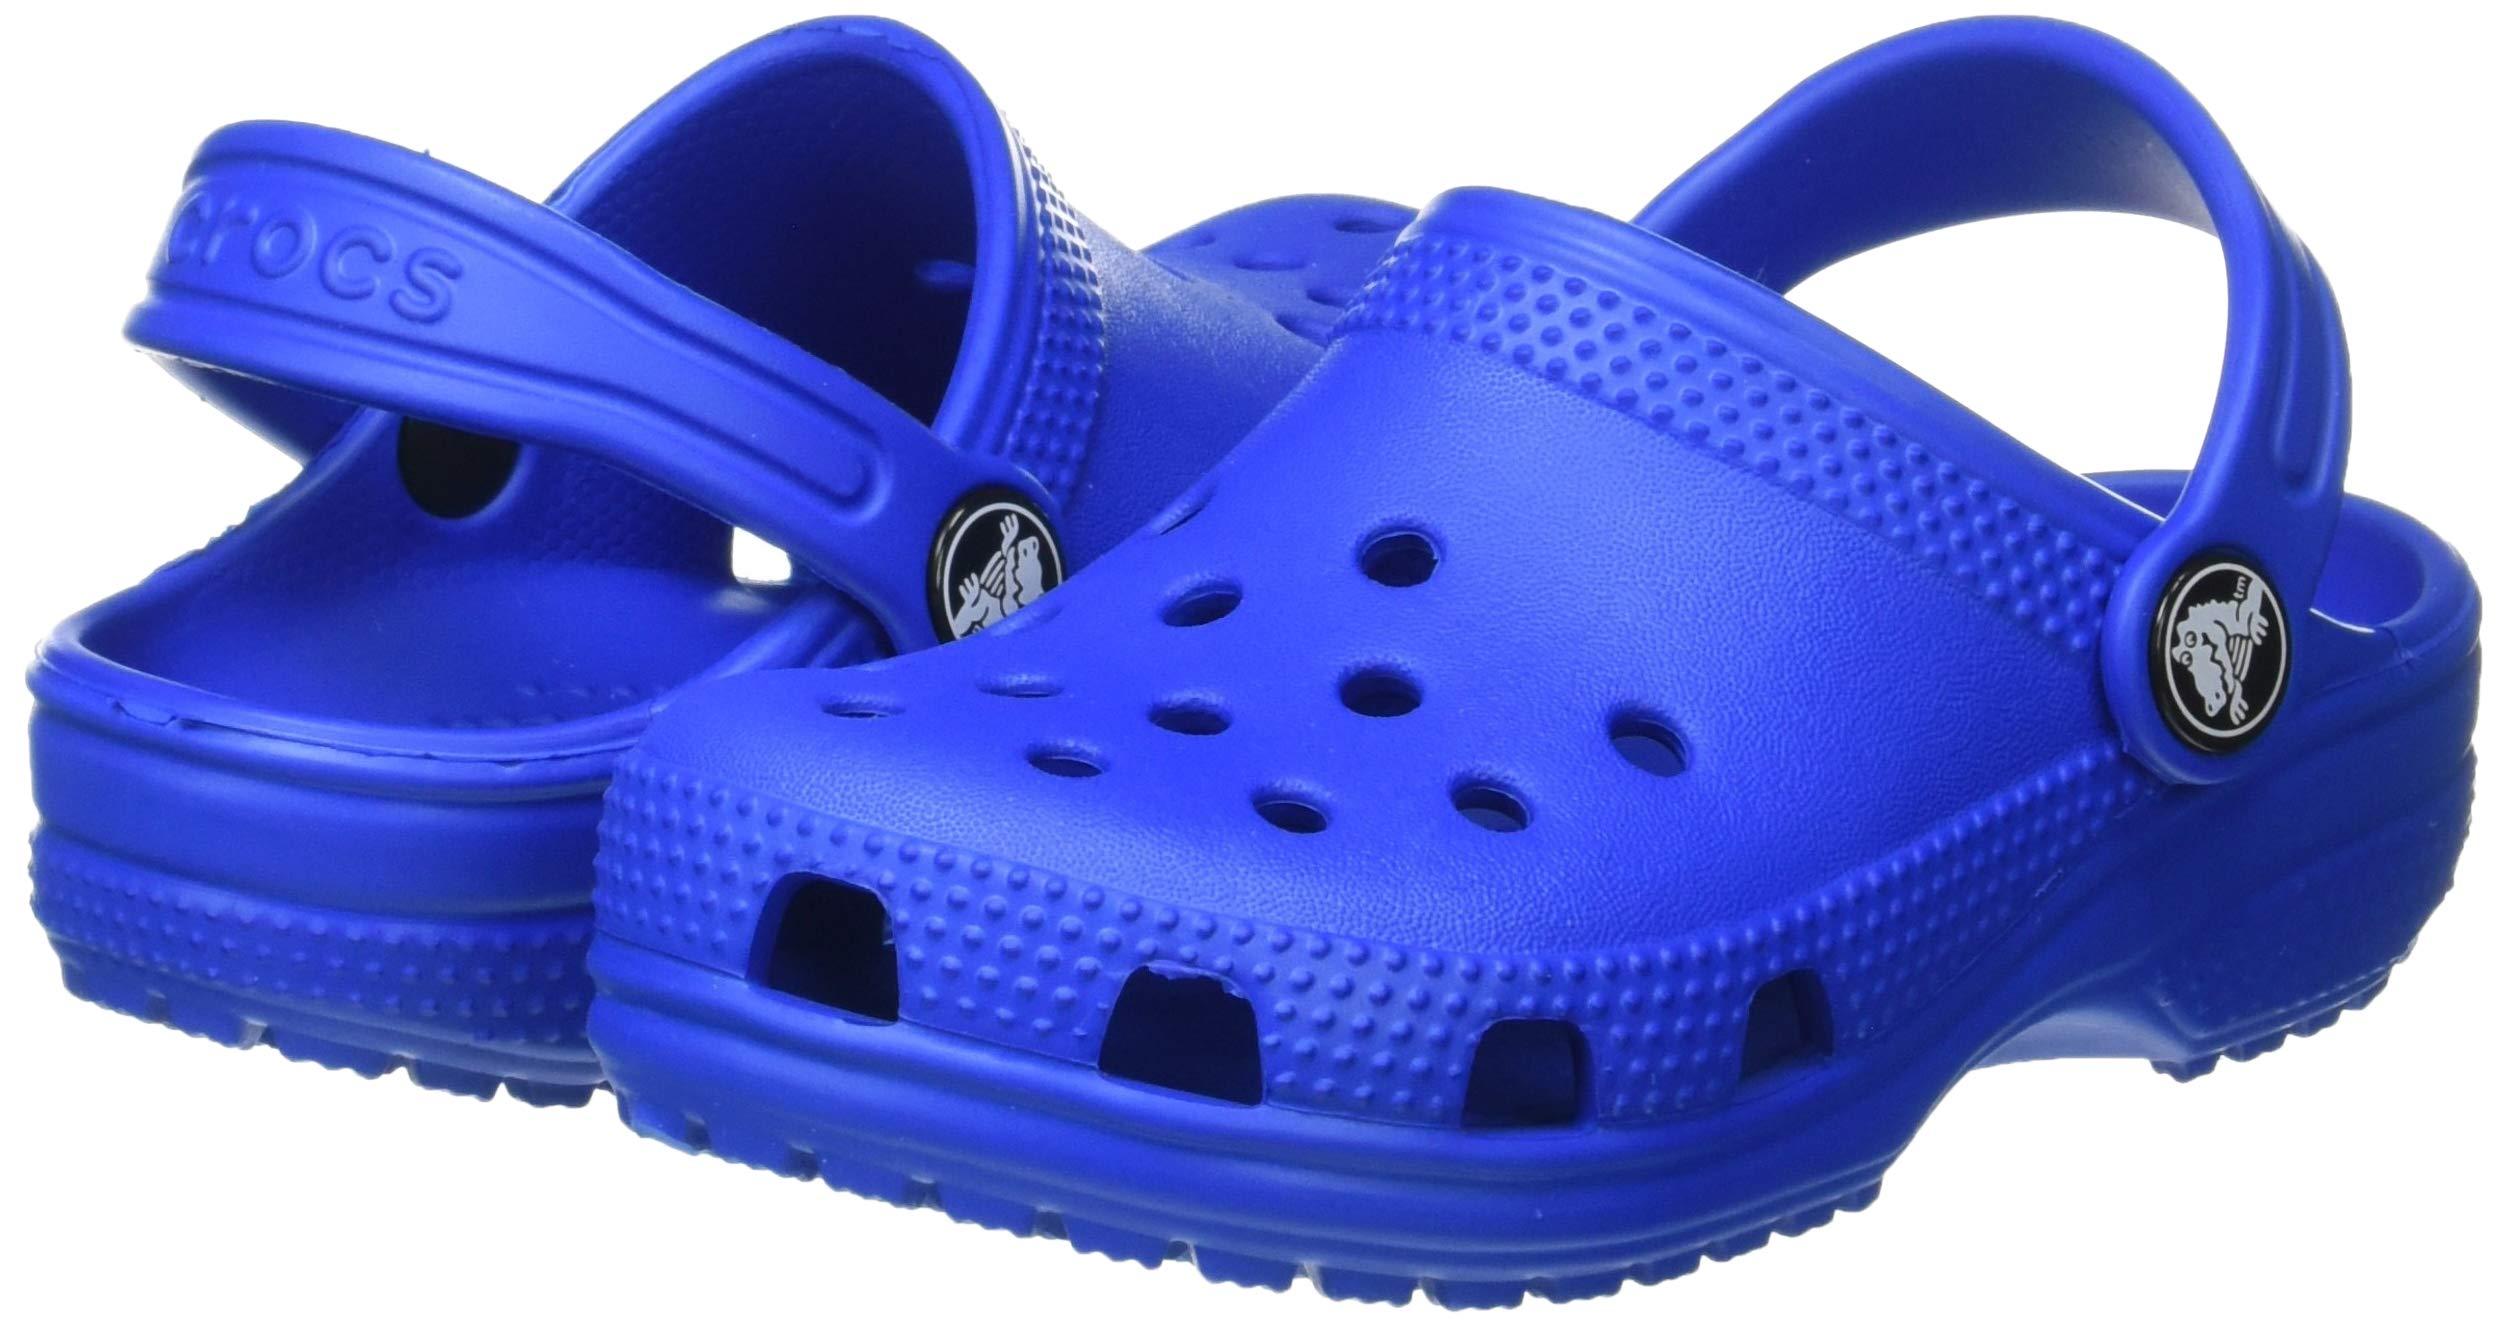 Crocs Classic Clog, Bright Cobalt, 13 M US Little Kid by Crocs (Image #5)